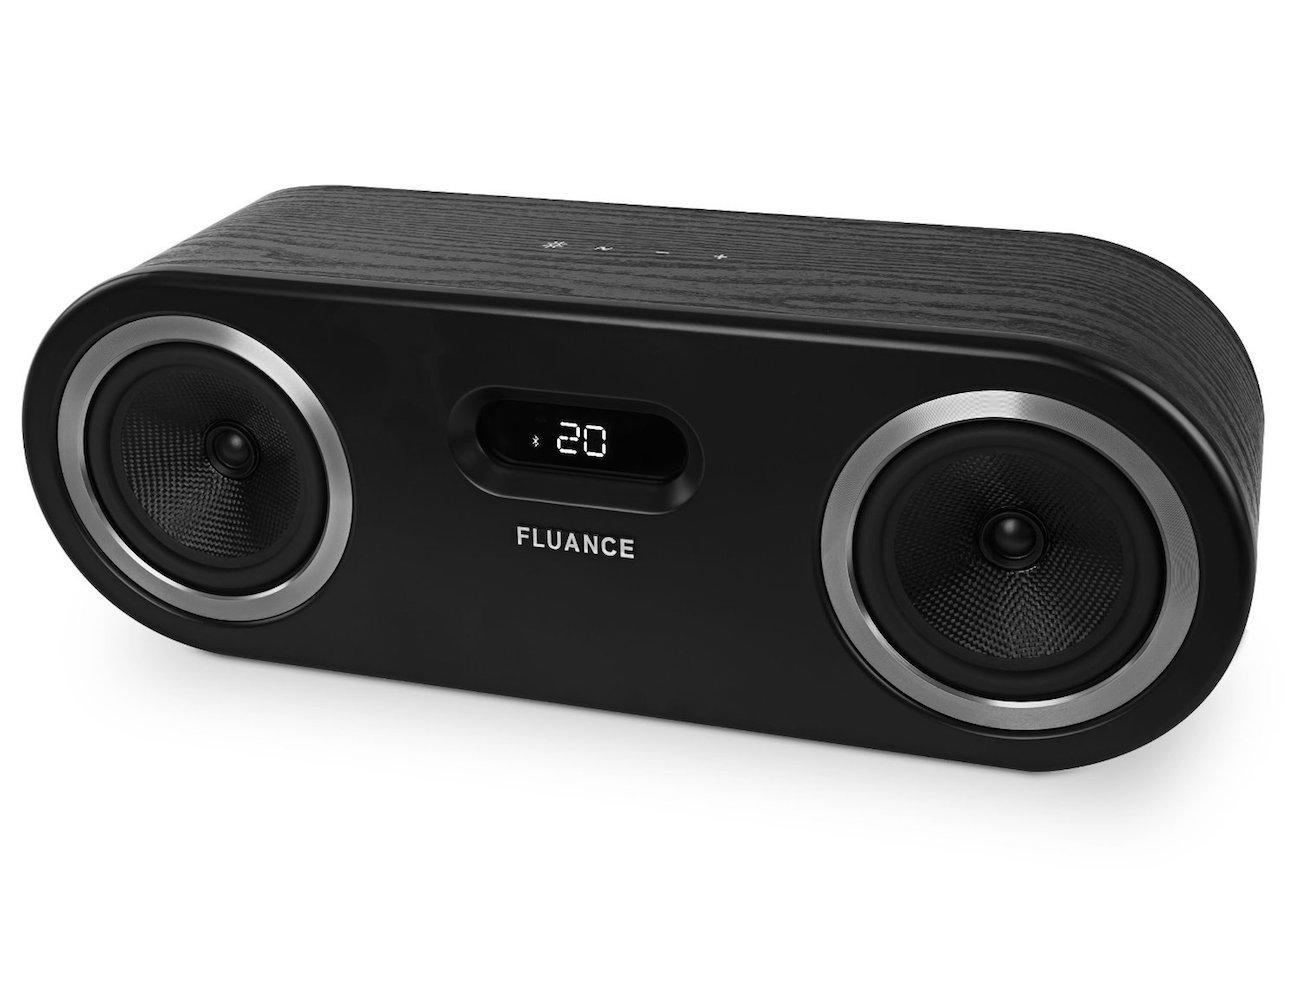 fluance-fi50-high-performance-bluetooth-wood-speaker-system-02